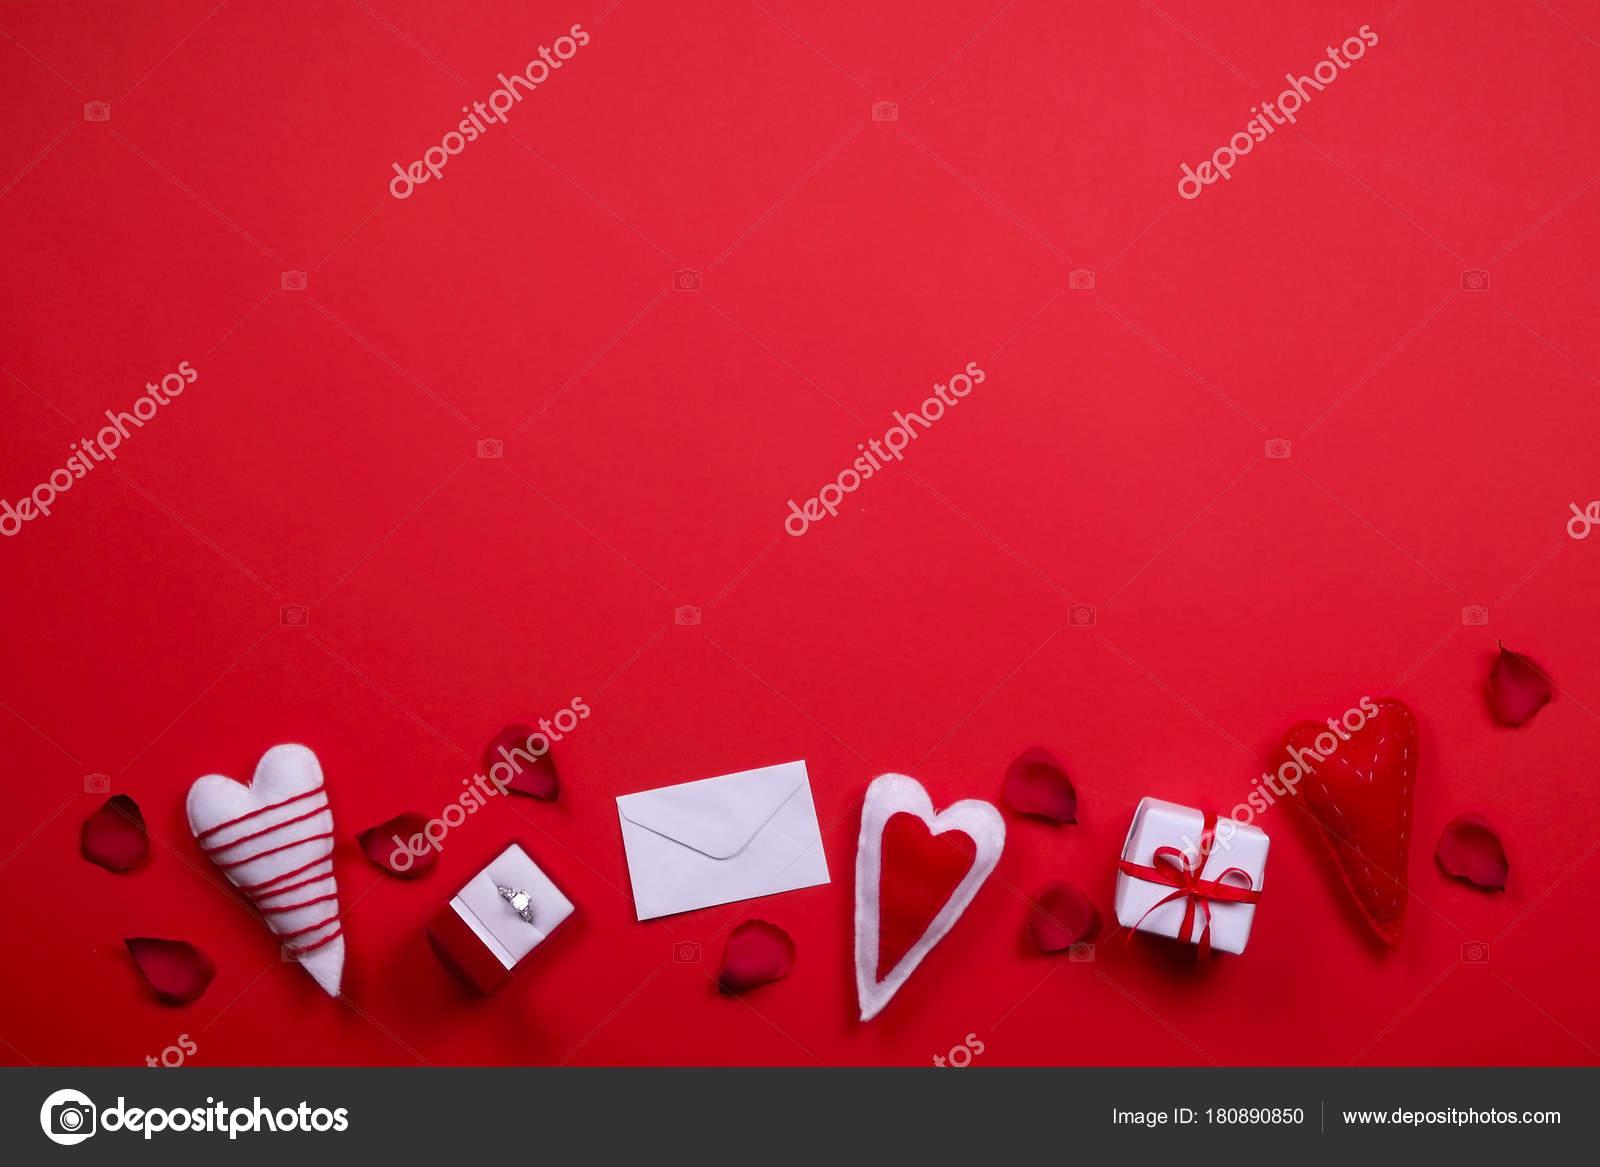 Happy valentines day love symbols concept on bright red background happy valentines day love symbols concept on bright red background stock photo buycottarizona Gallery